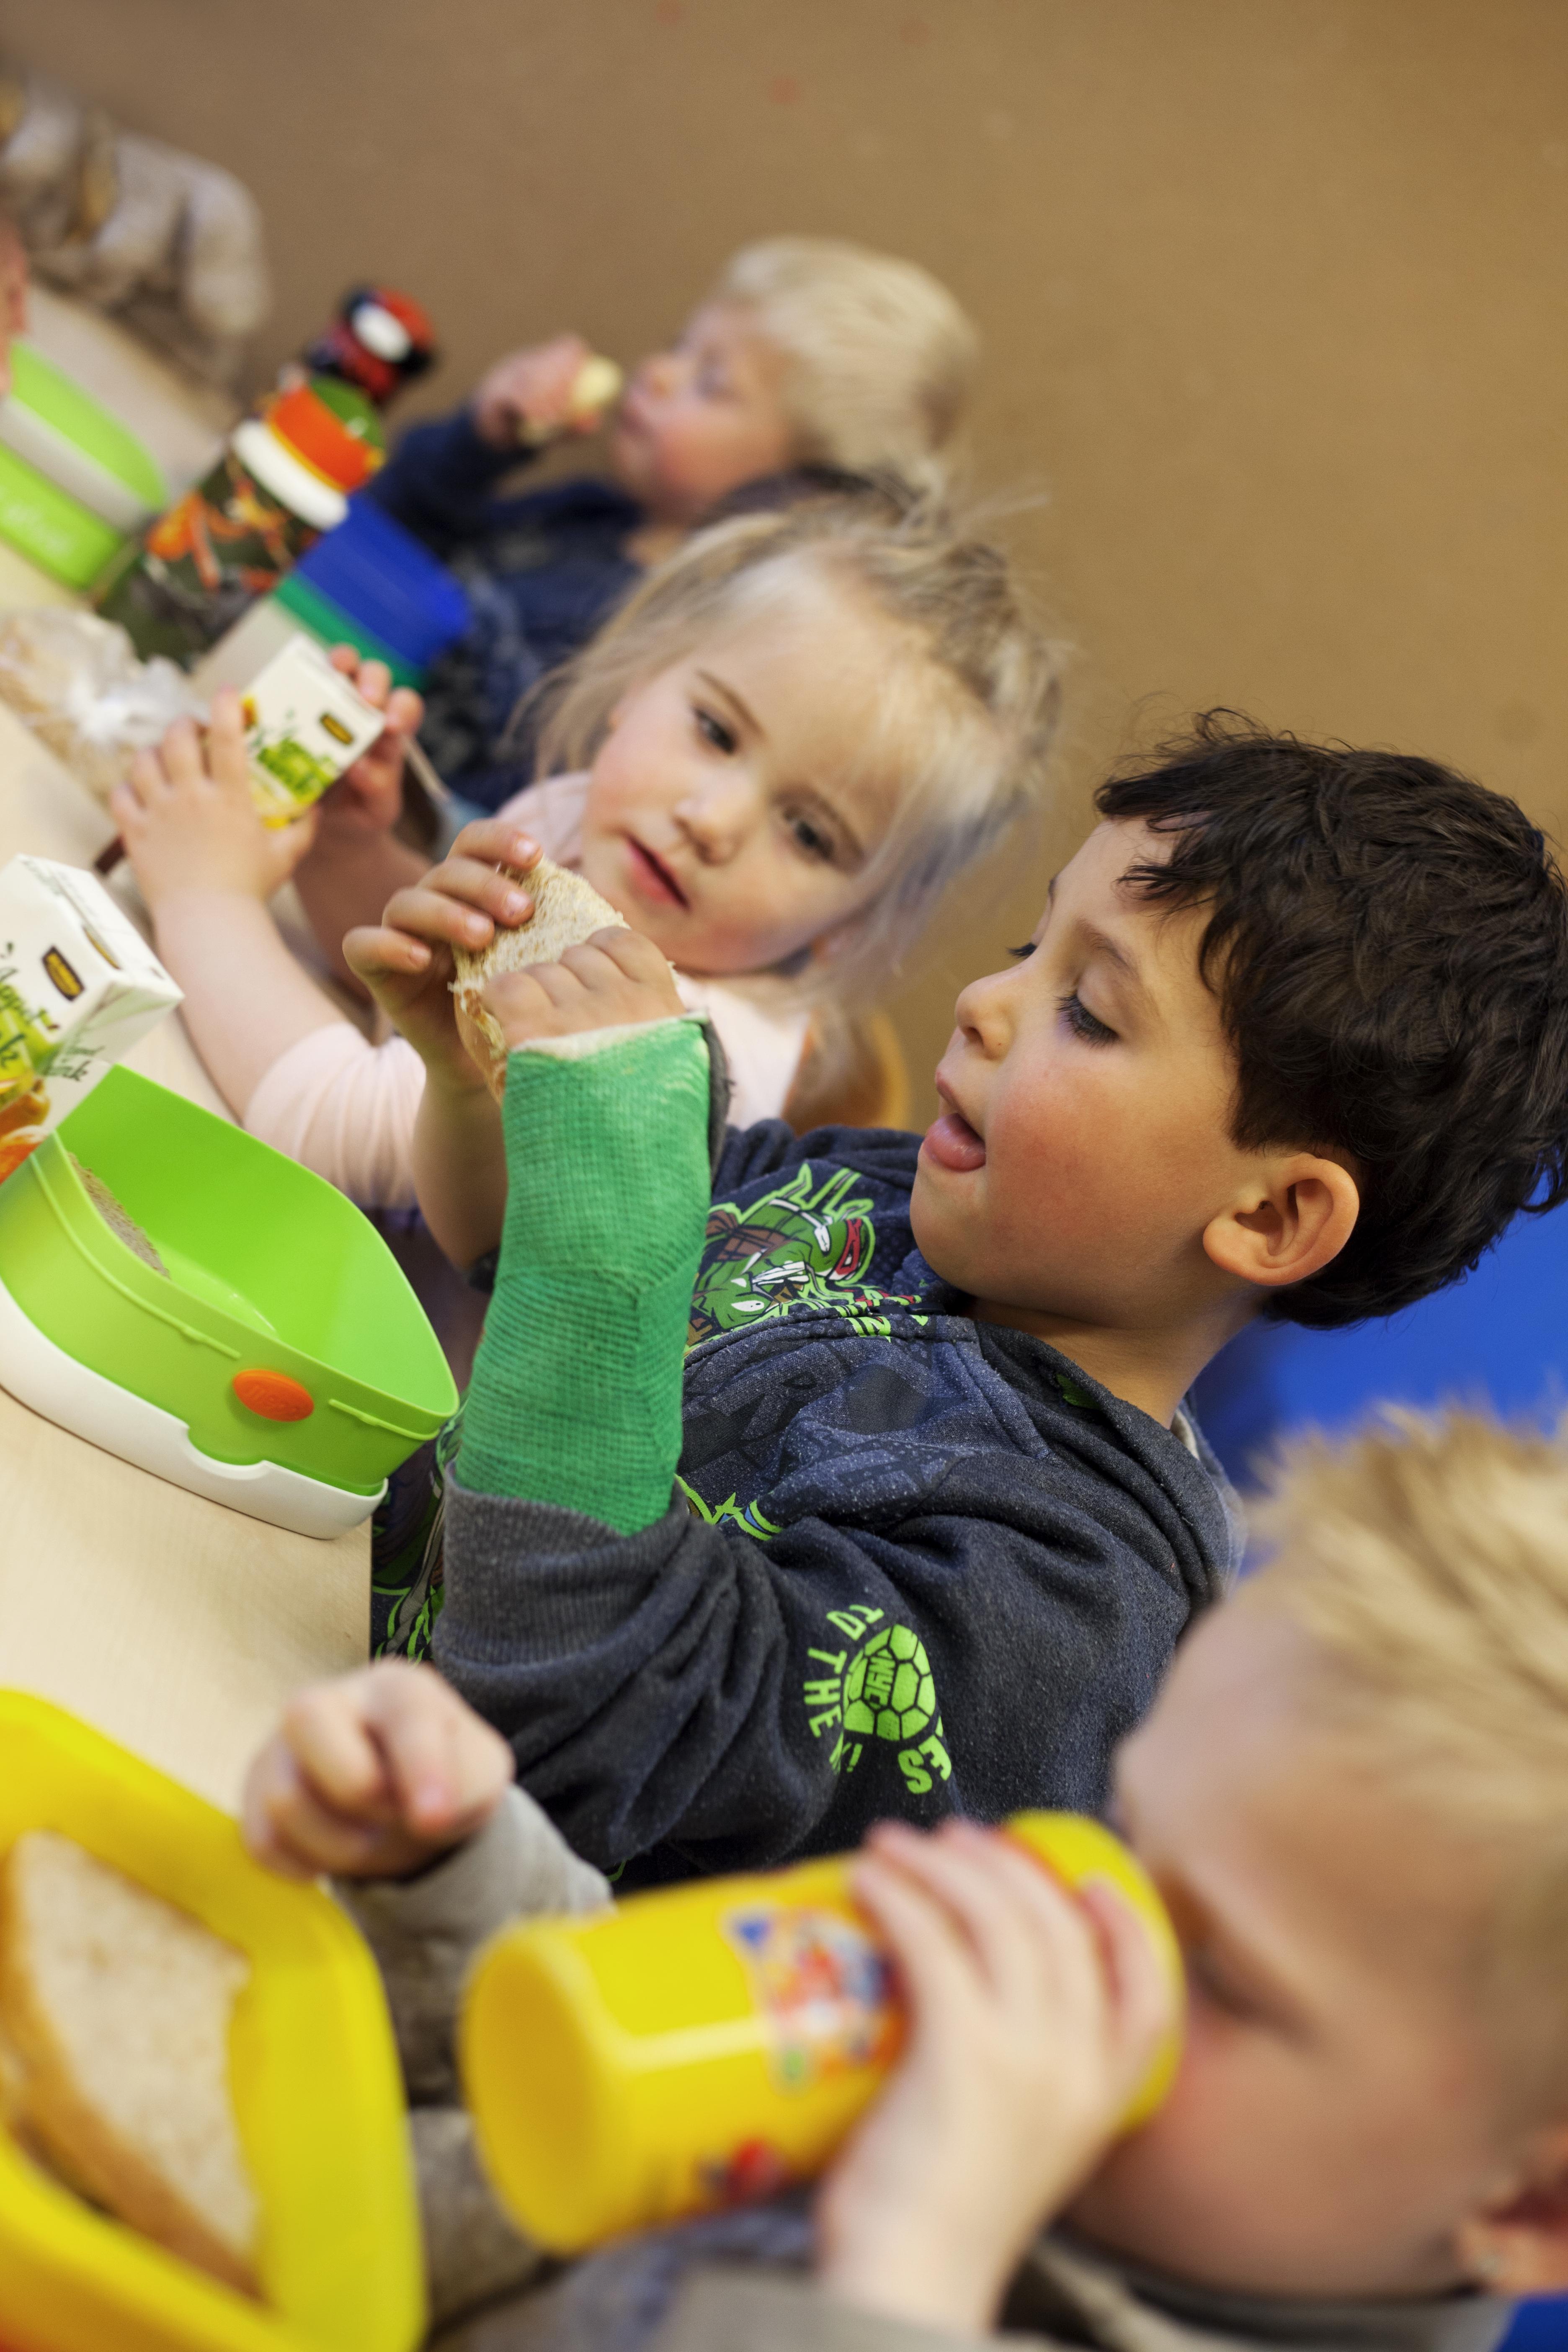 Peuteropvang Ons Speulplakky in Sint Jacobiparochie - Kids First COP groep